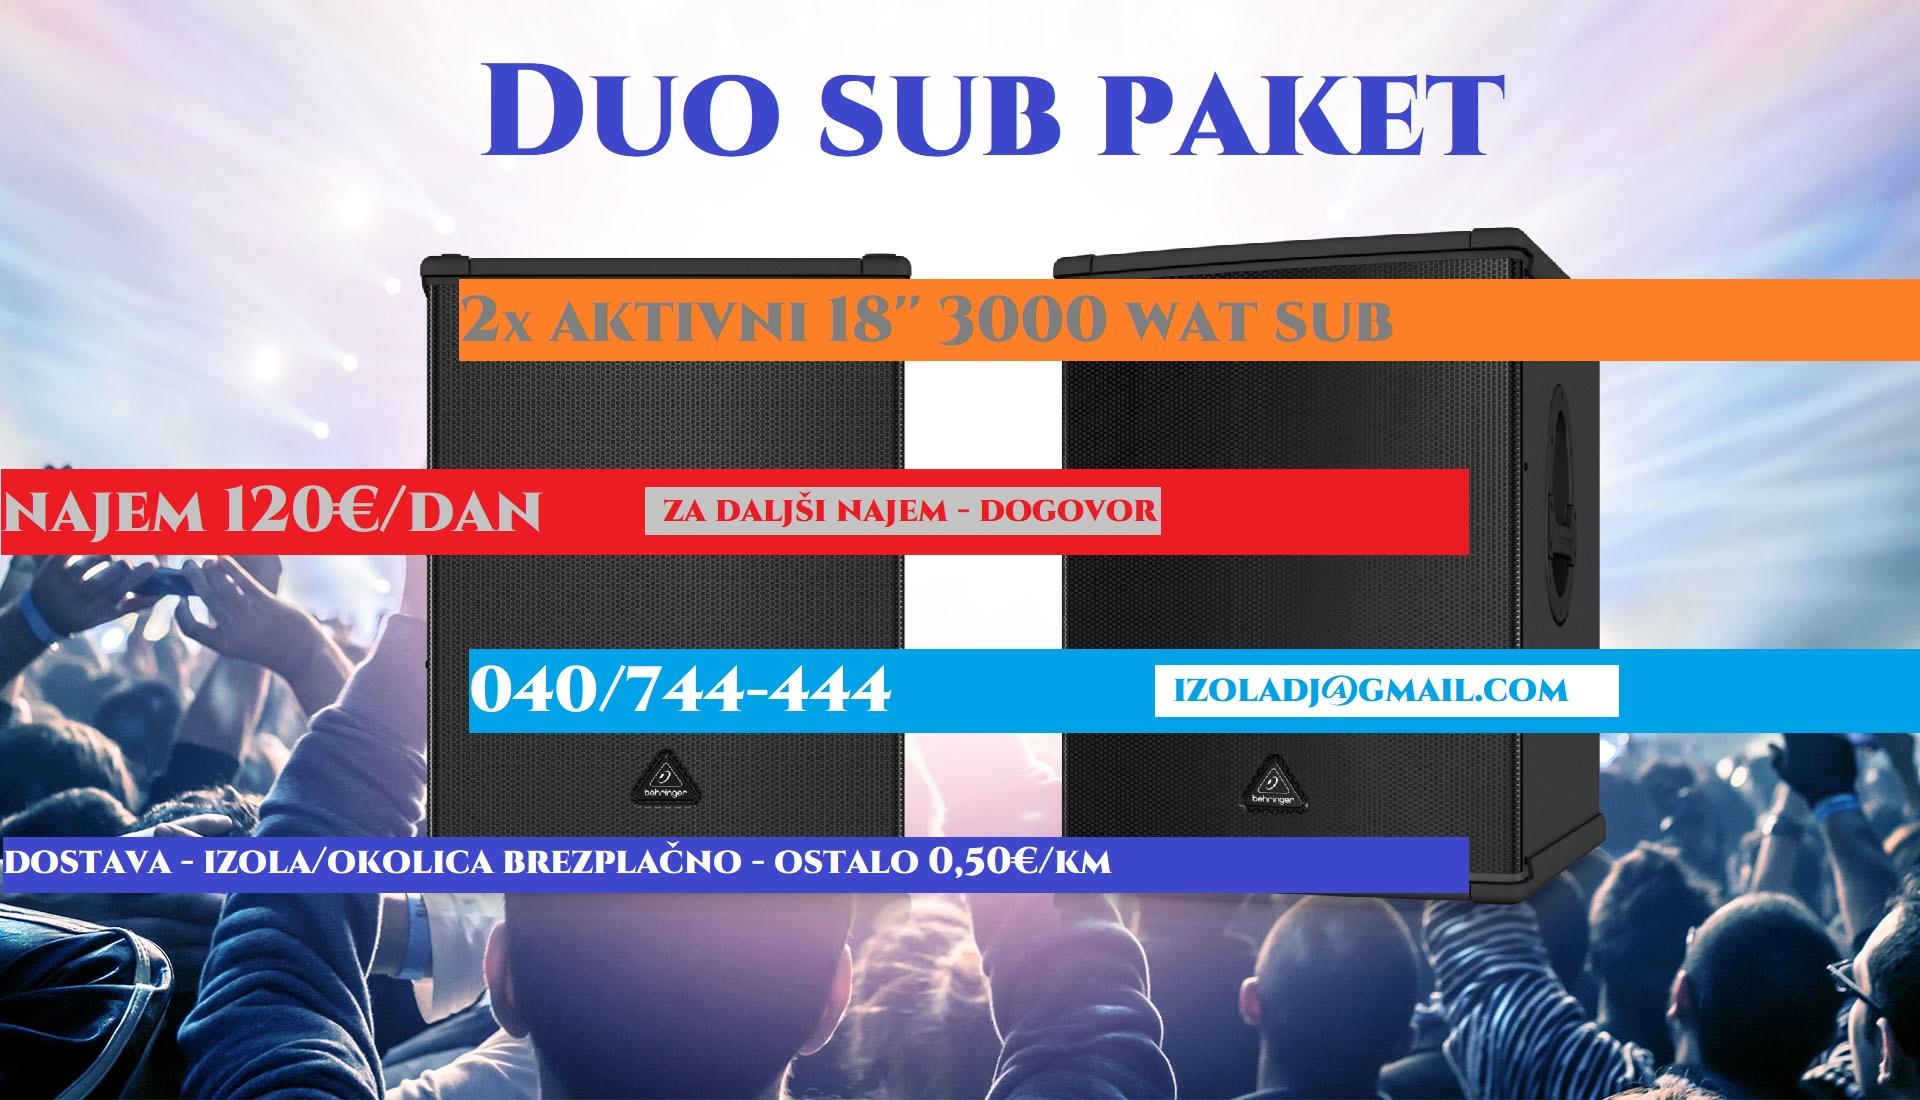 Duo Sub Paket